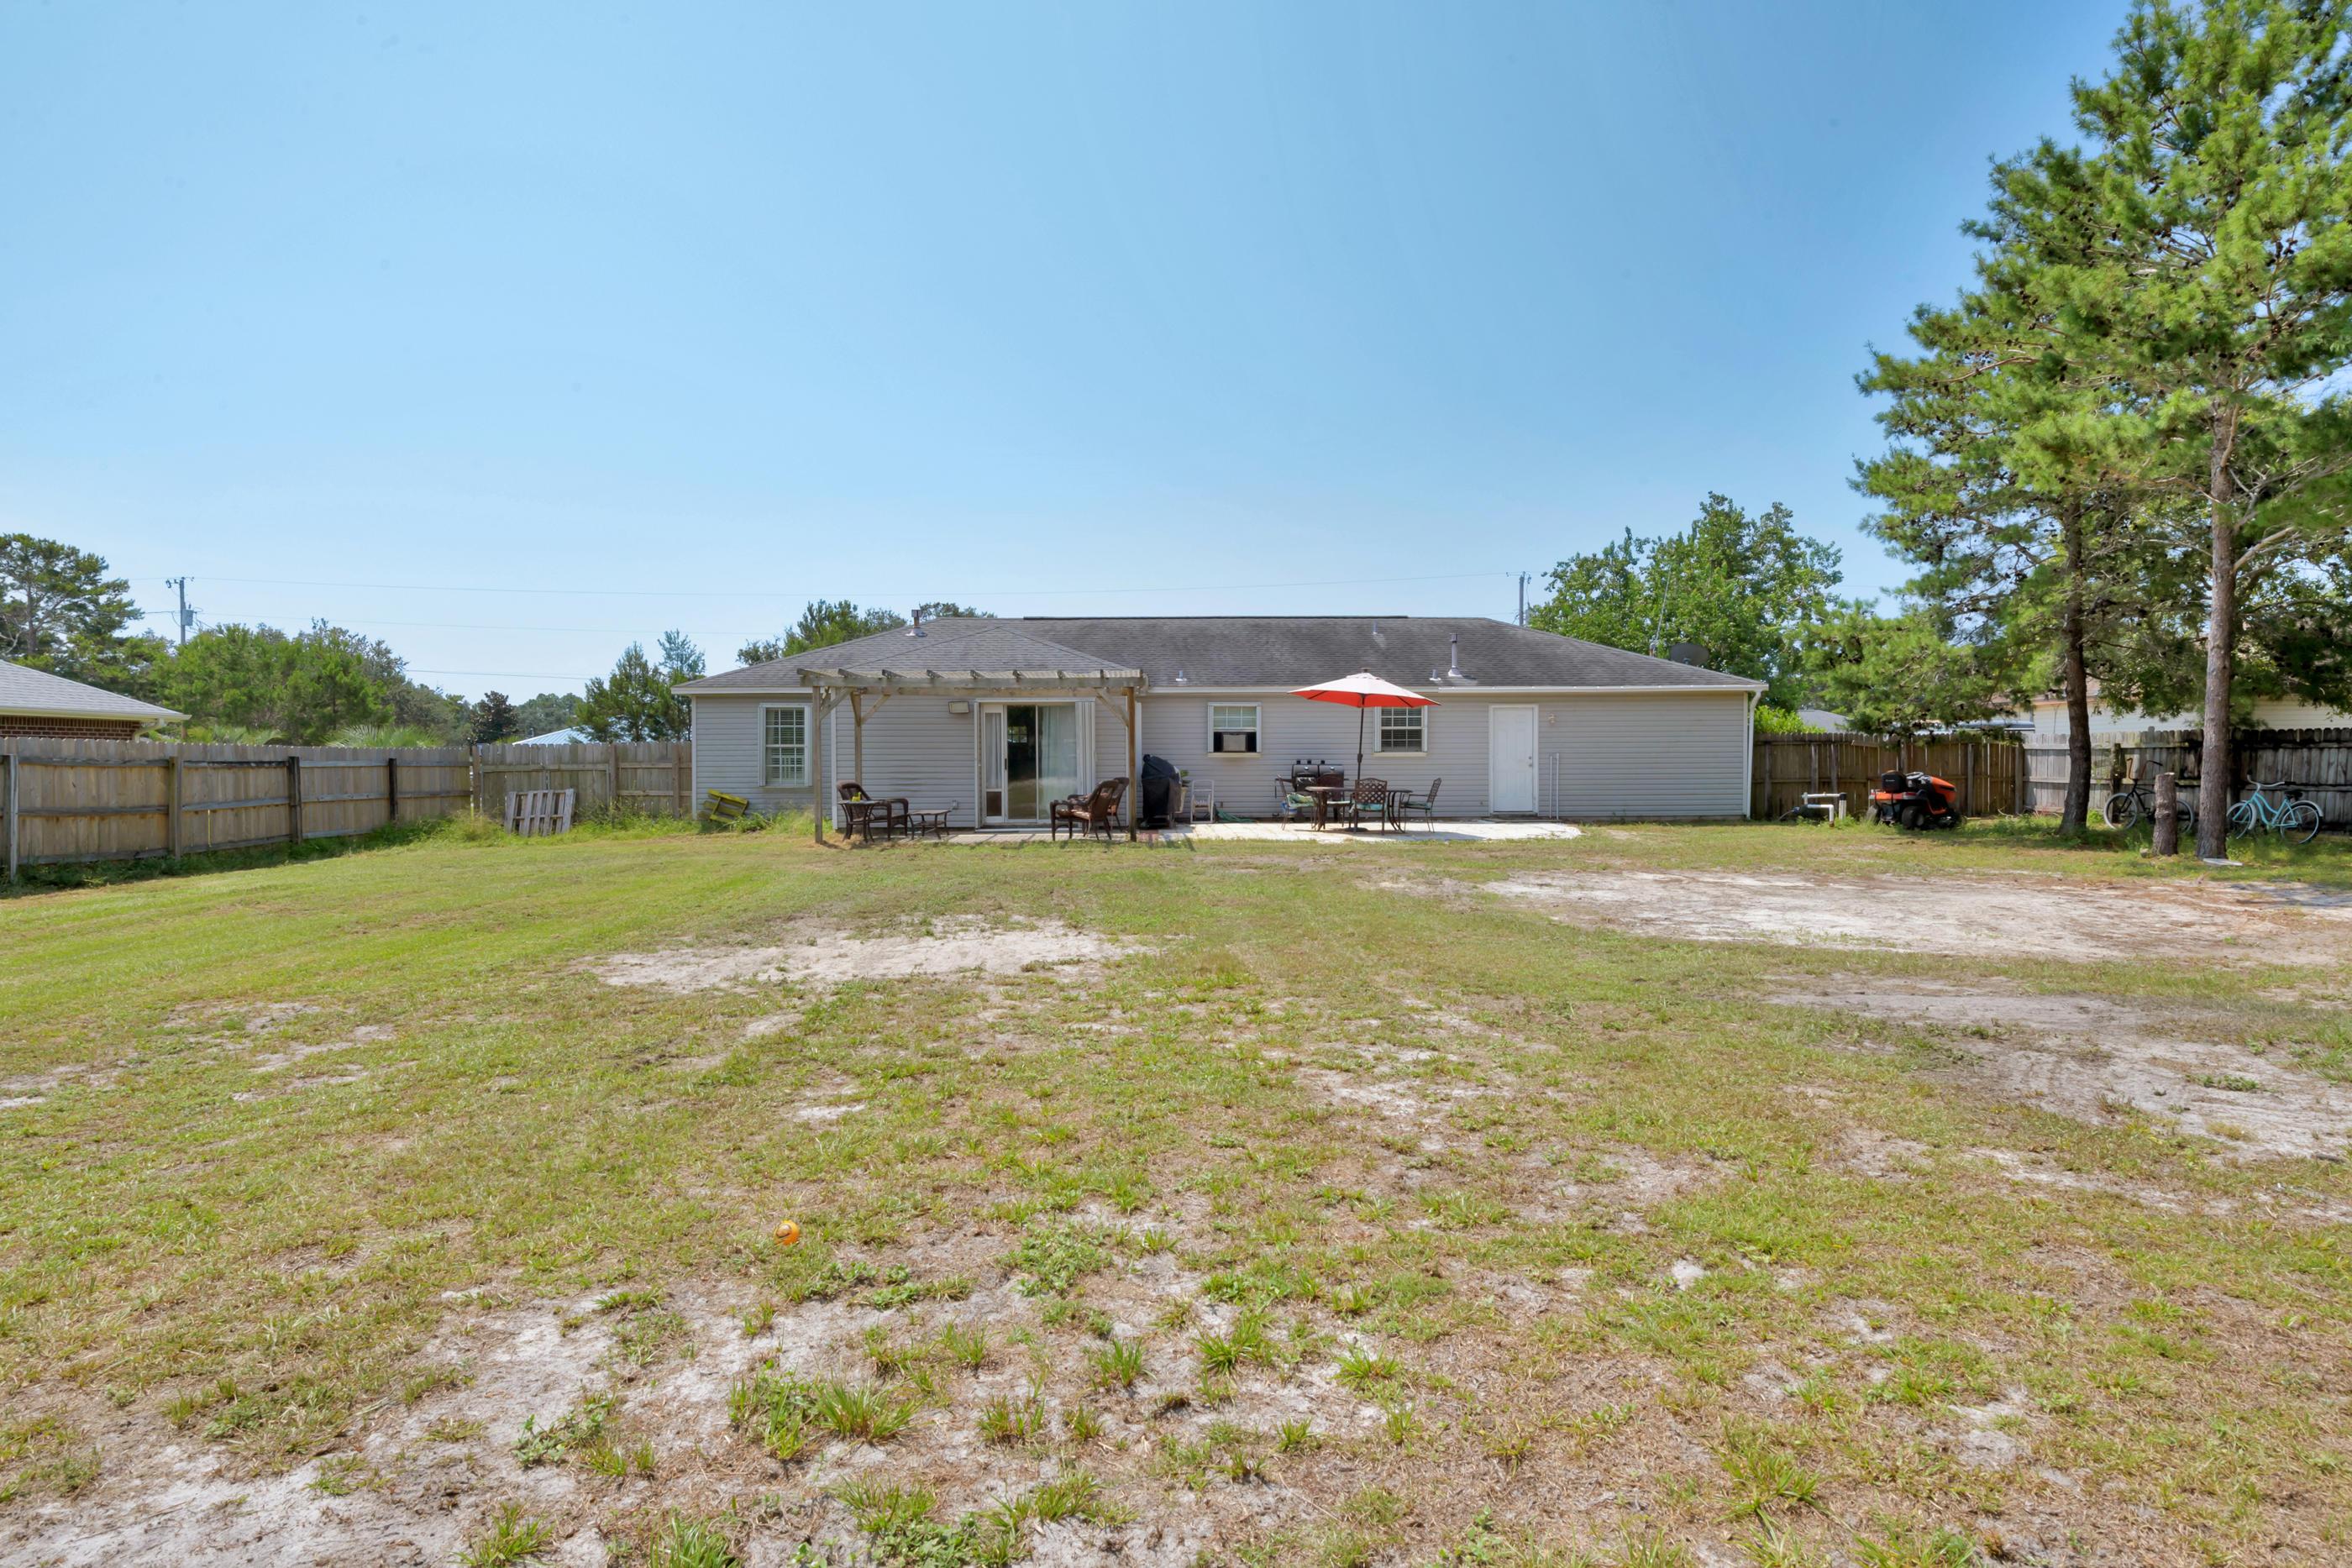 Photo of home for sale at 8638 Estrada, Navarre FL